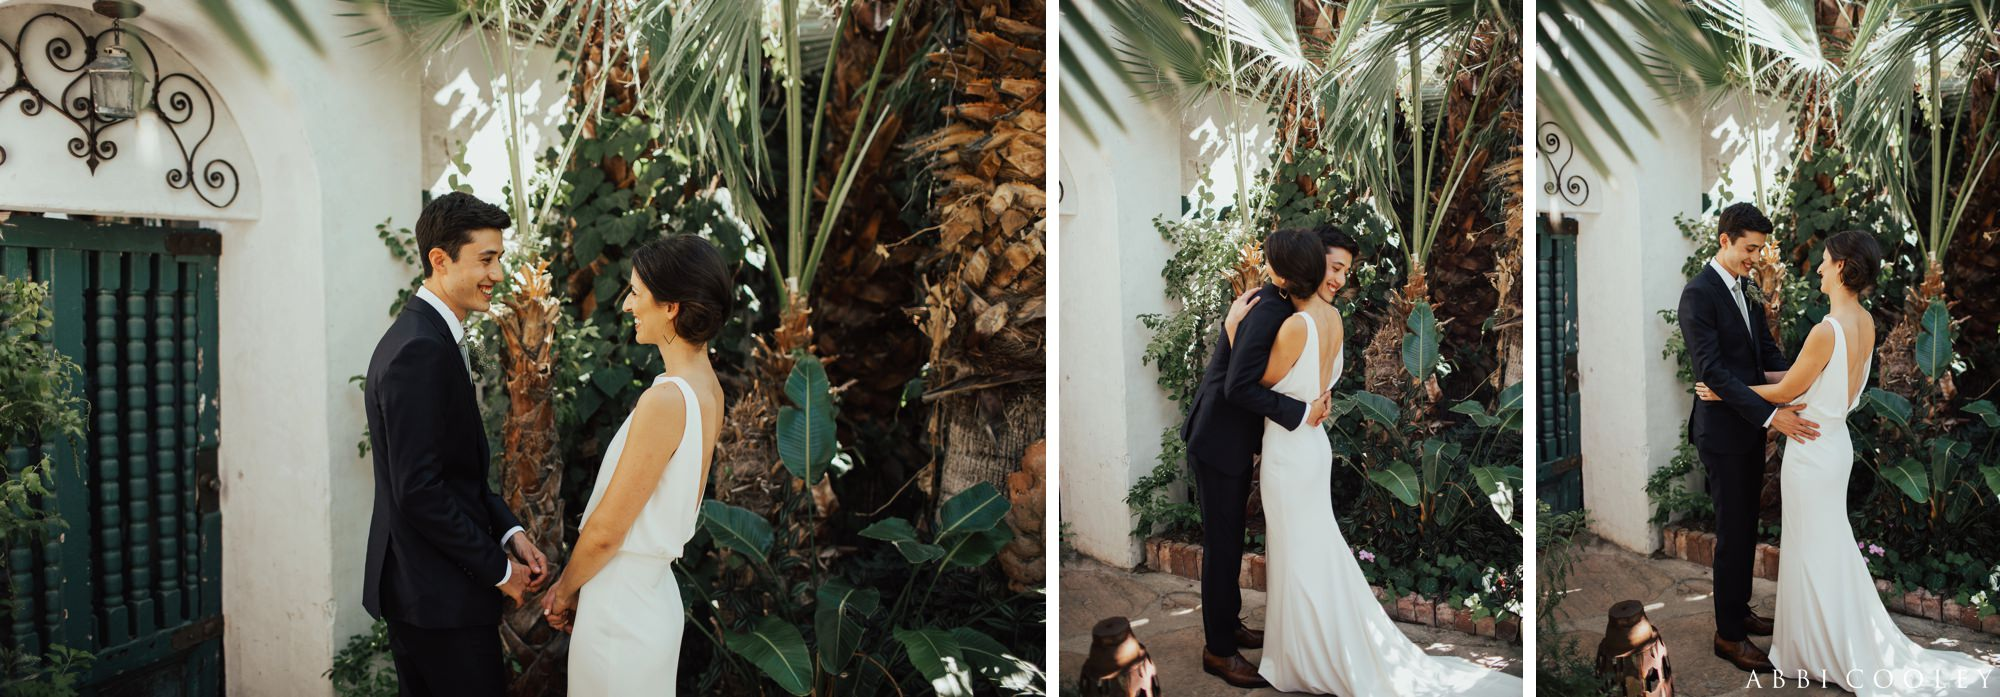 First look Casa de Monte Vista Palm Springs Wedding